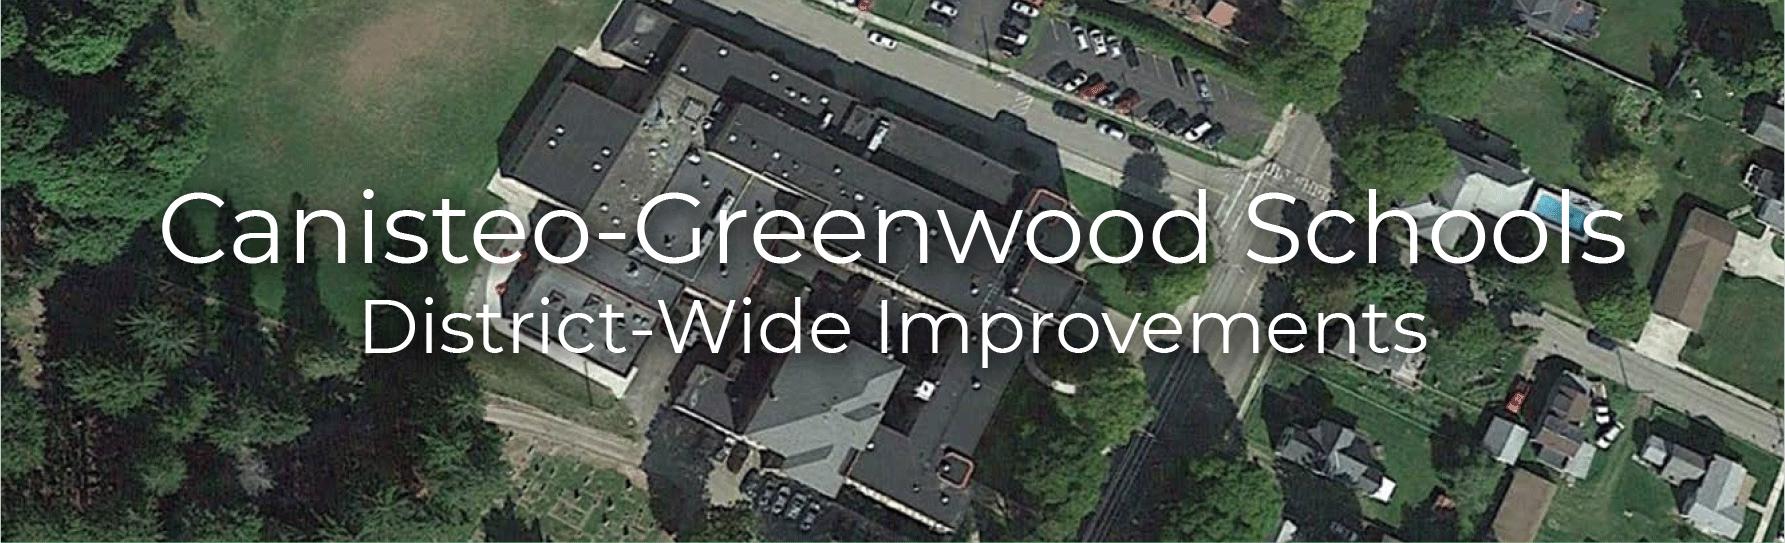 Canisteo-Greenwood Schools